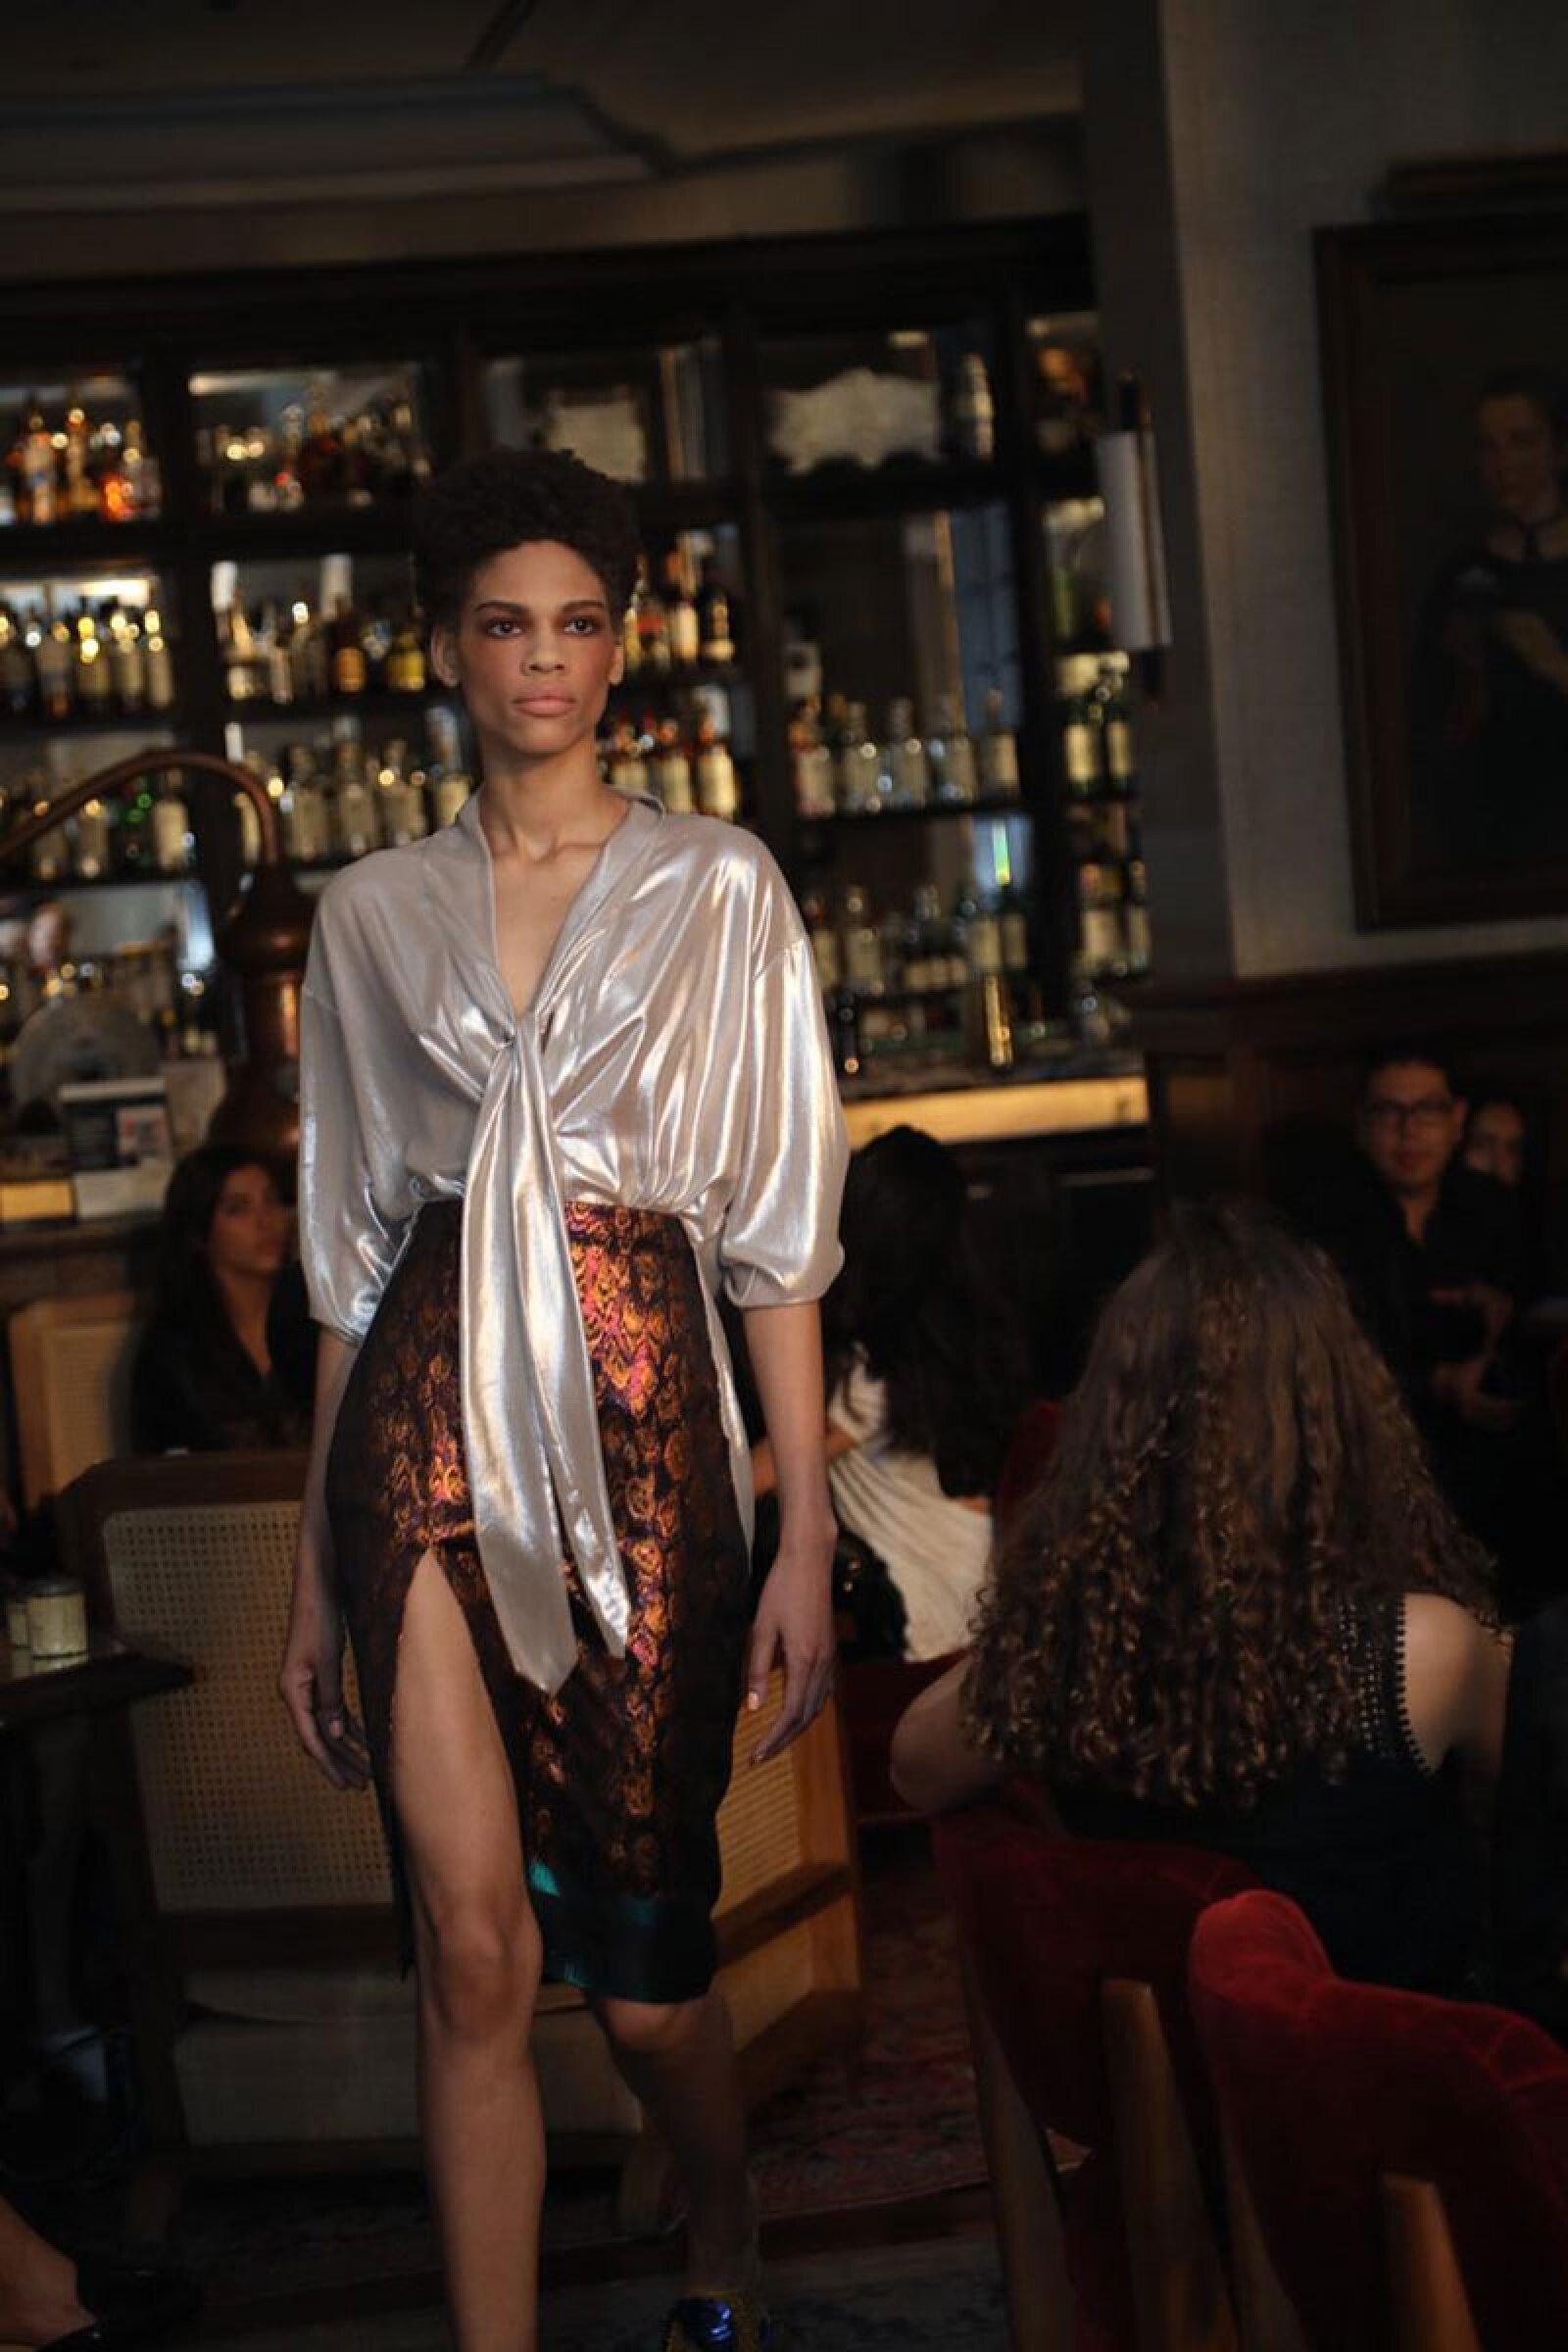 Sandra-Weil-MBFWM-Runway-Blouse-and-Skirt-Look